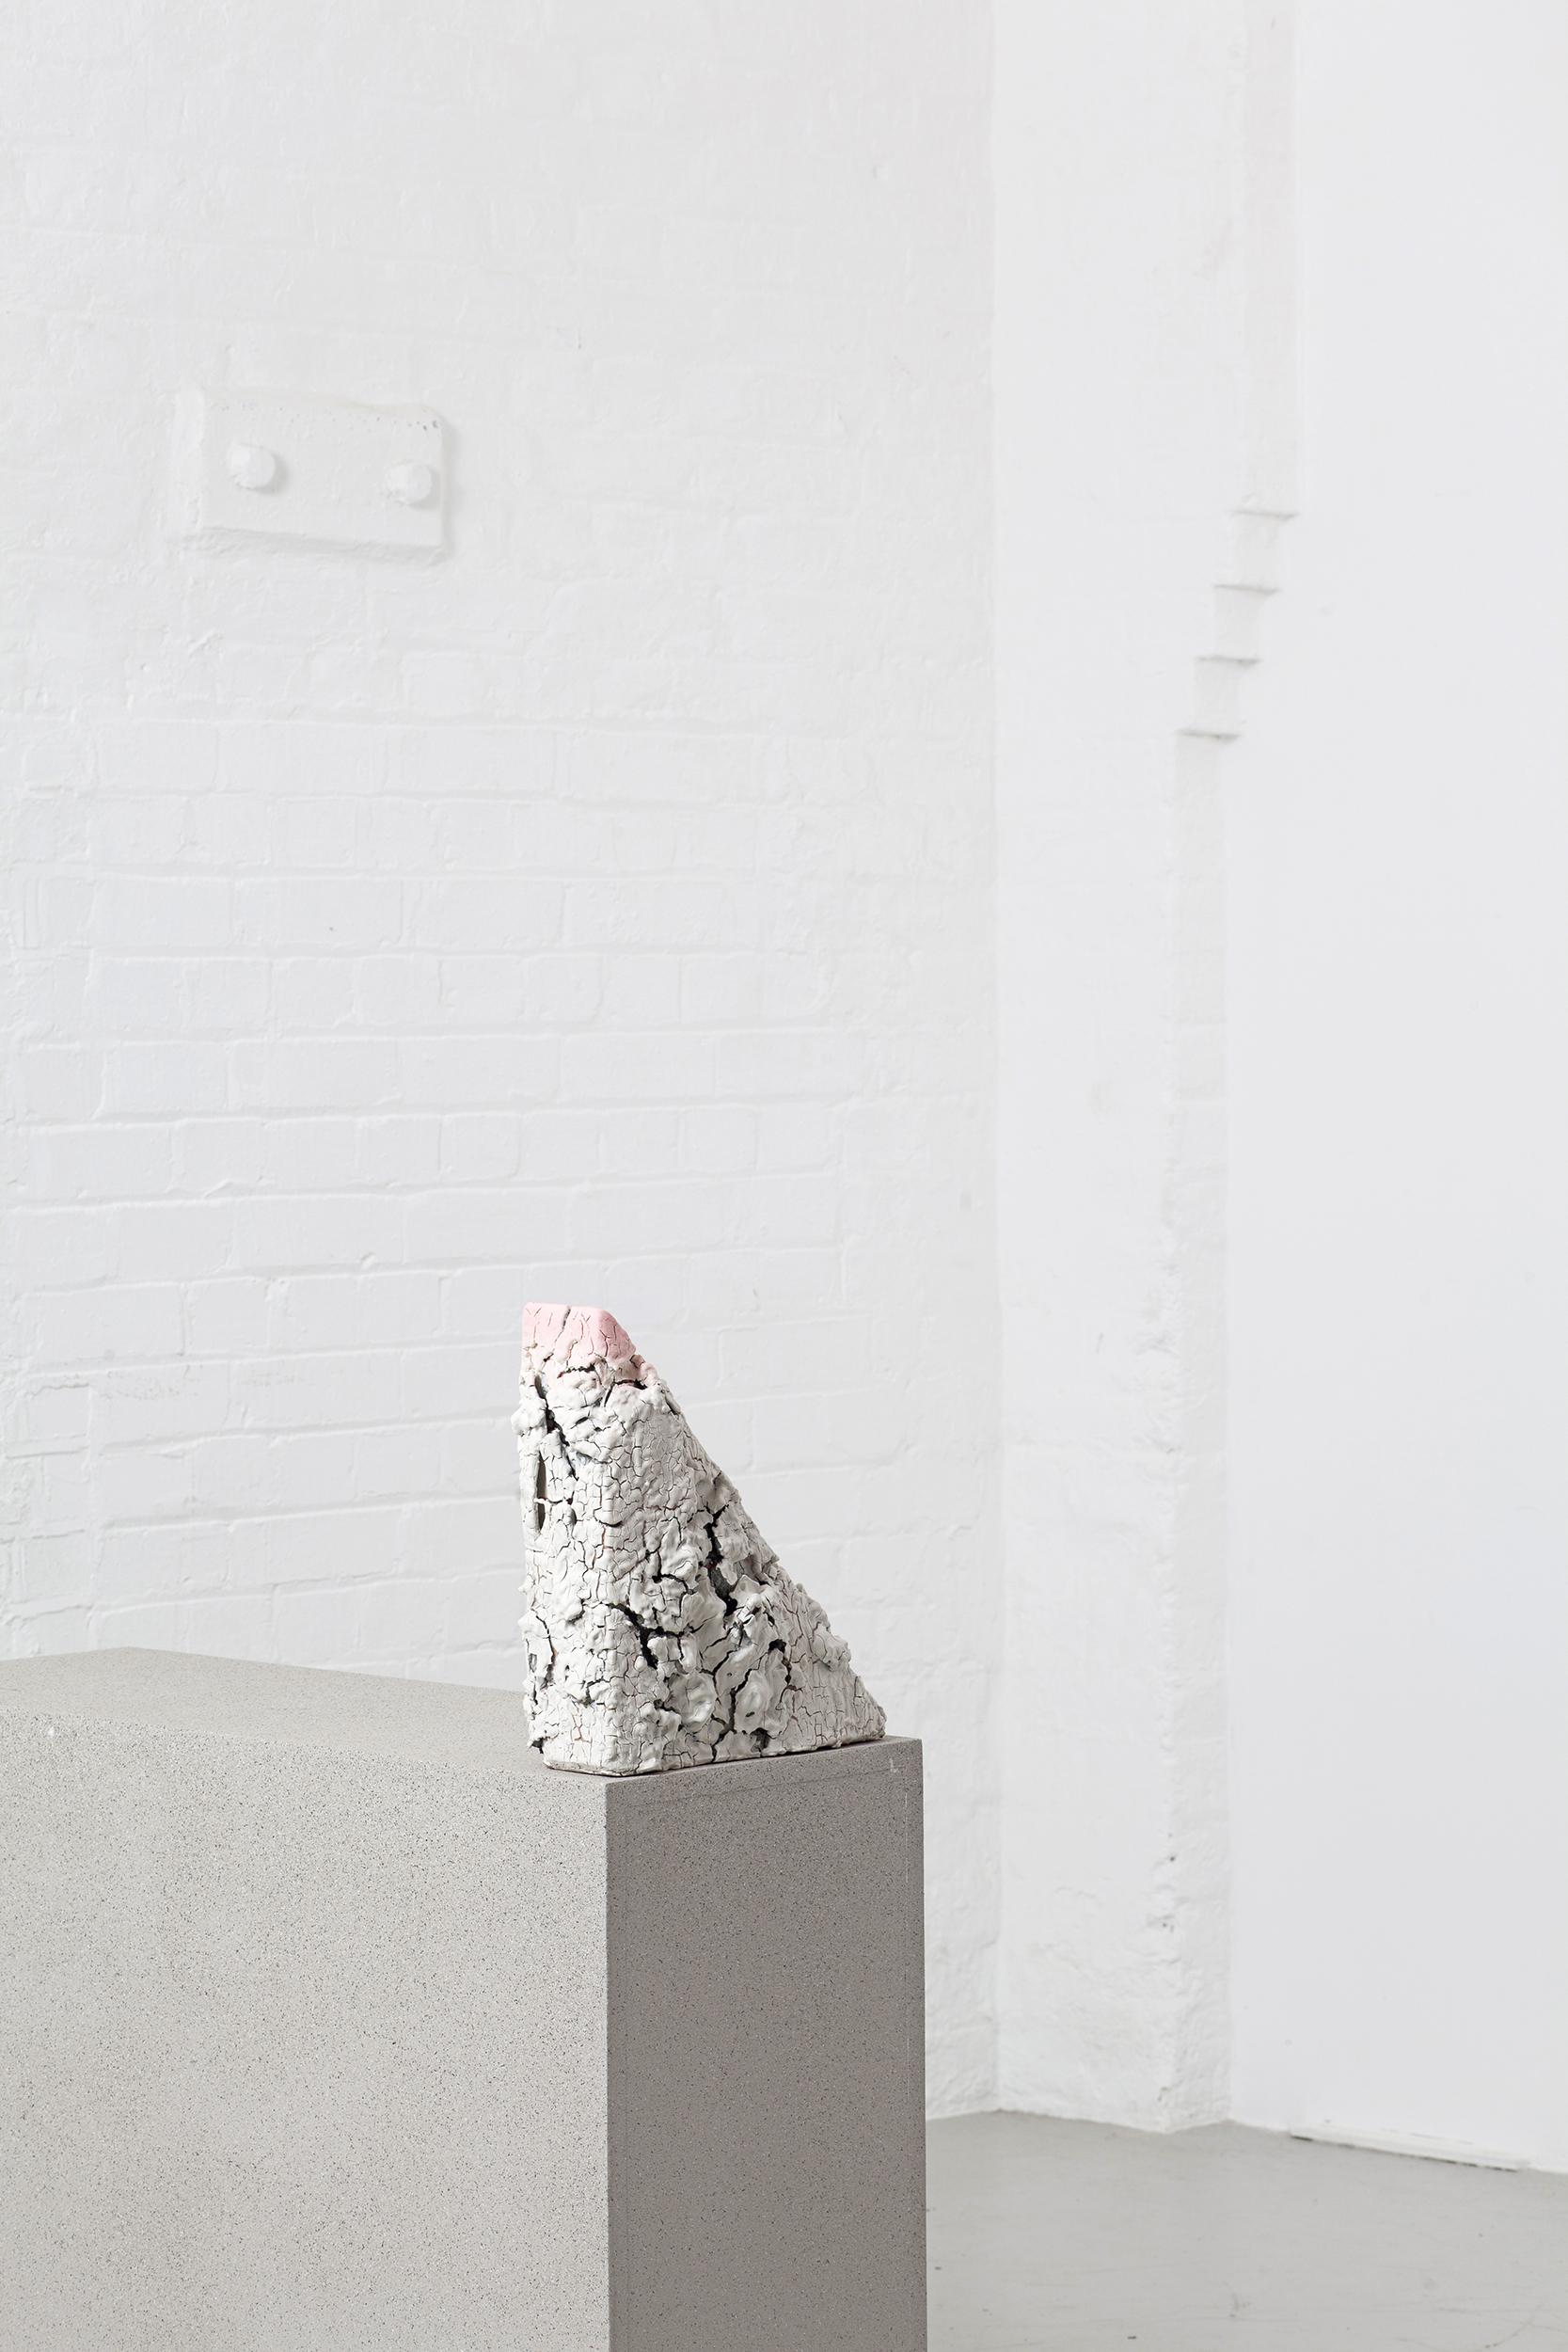 BUILT – Irina Razumovskaya